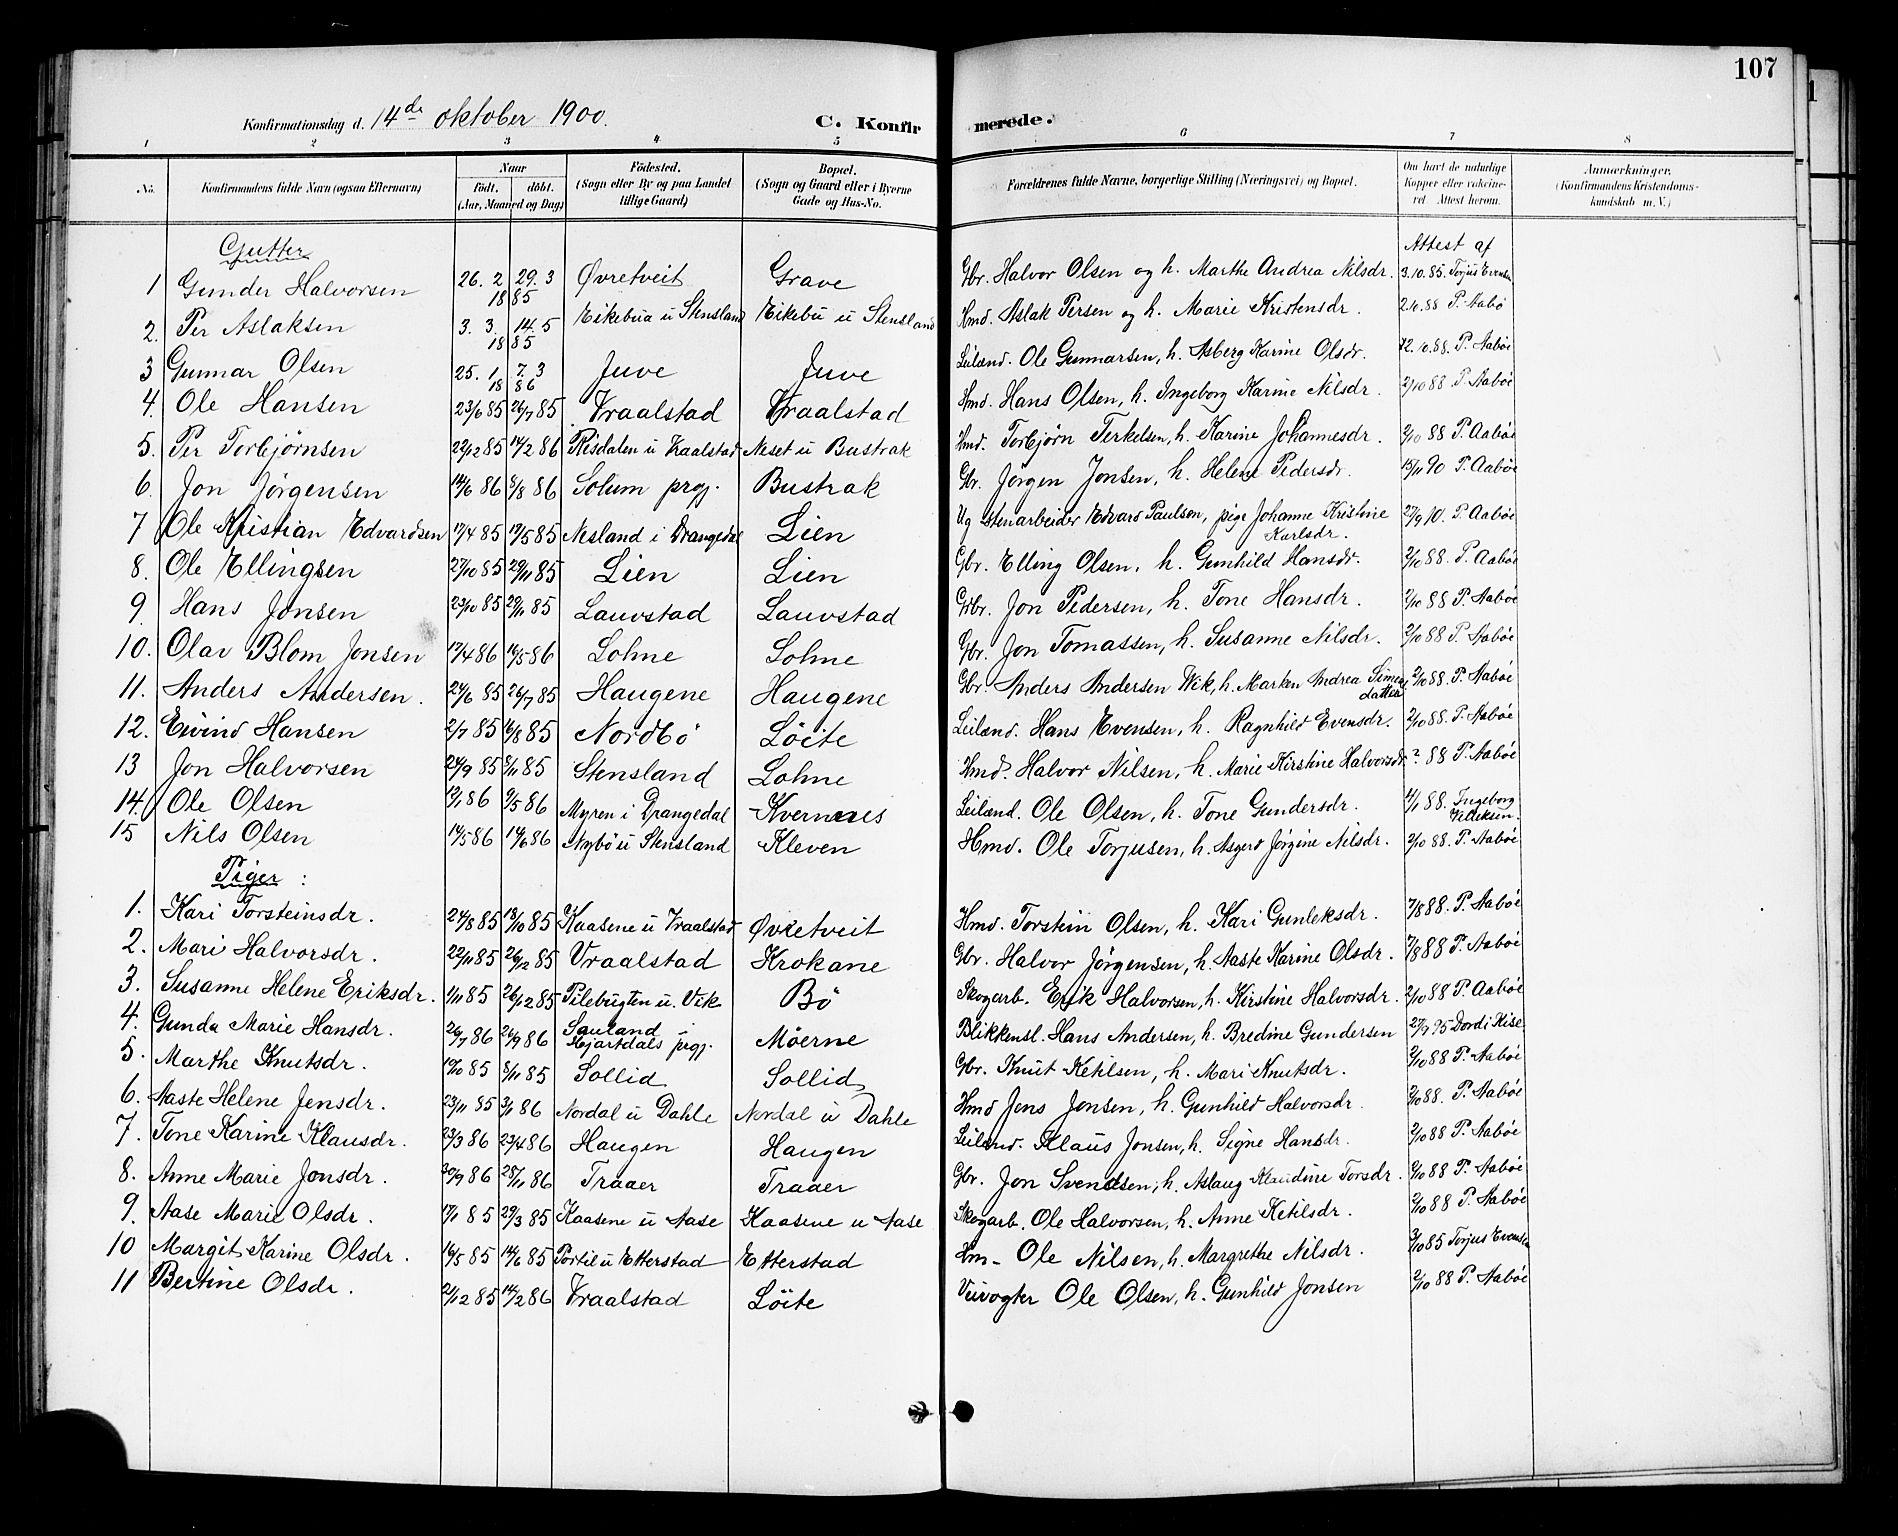 SAKO, Drangedal kirkebøker, G/Gb/L0002: Klokkerbok nr. II 2, 1895-1918, s. 107